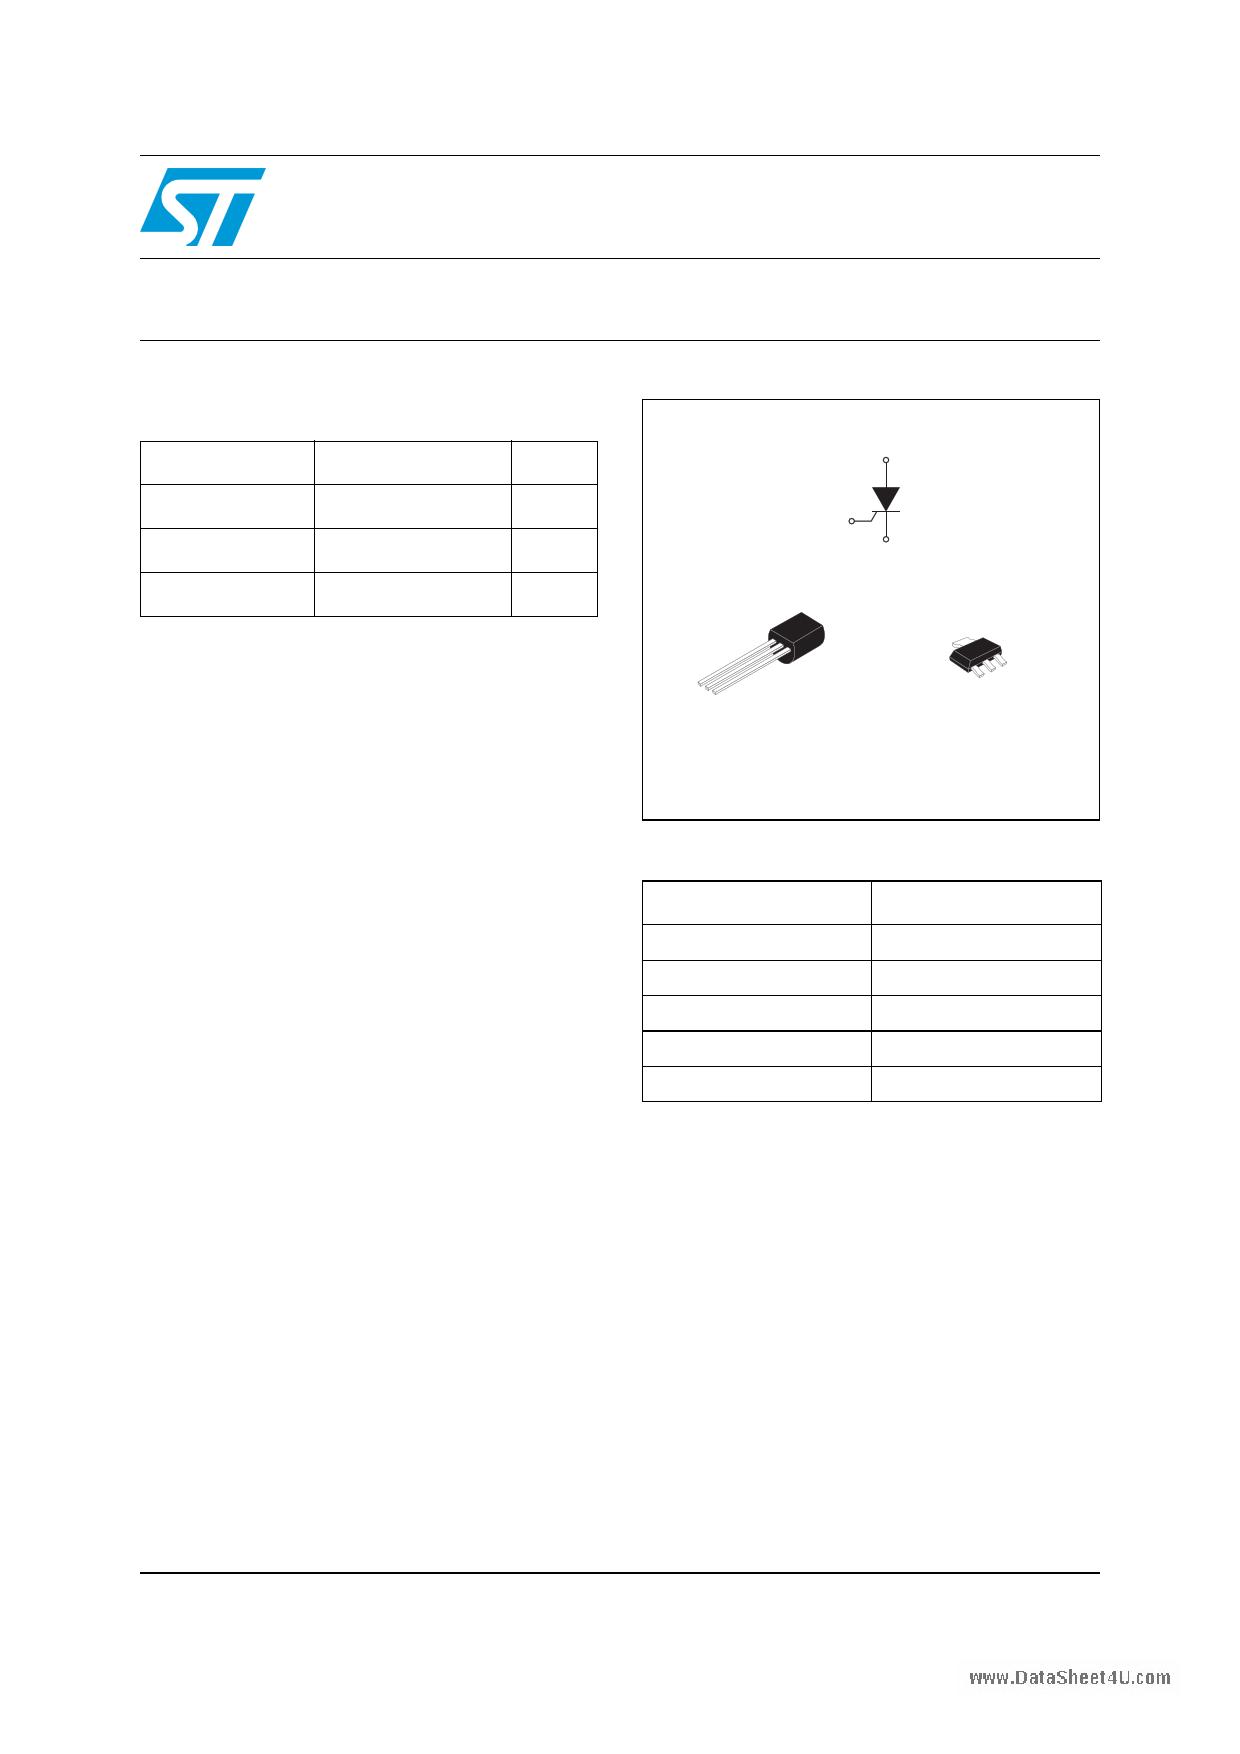 X006 datasheet